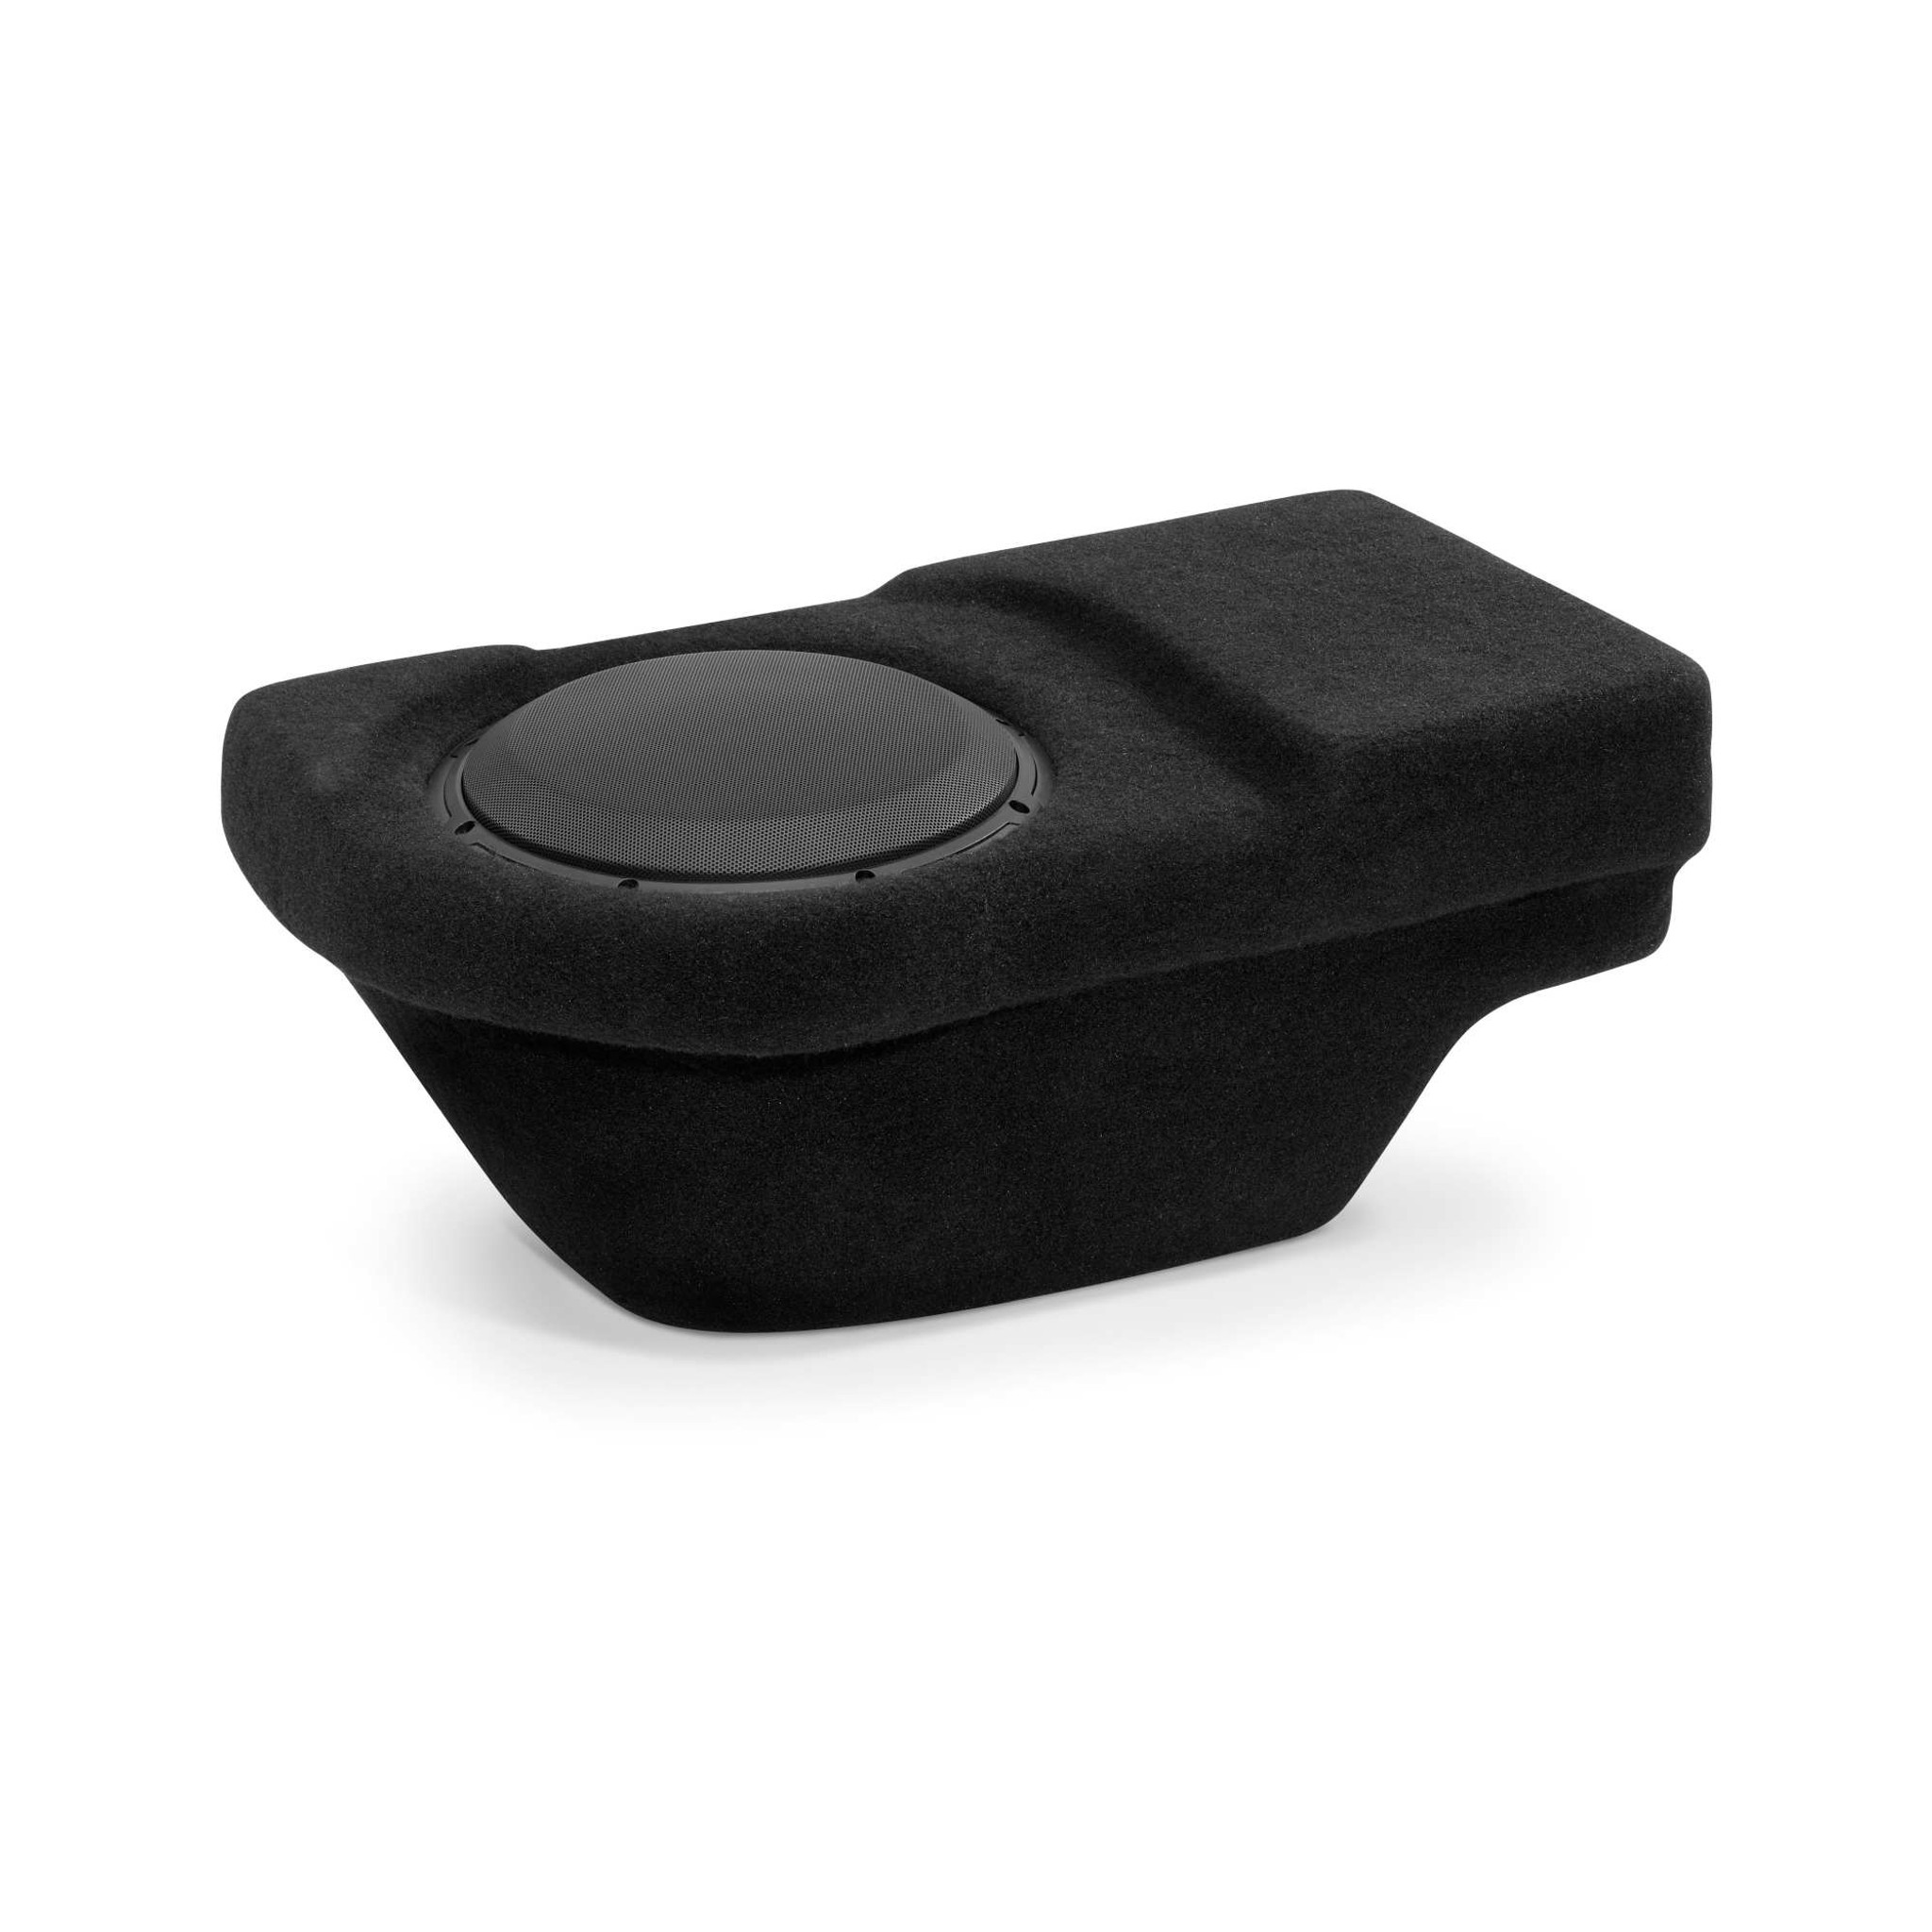 JL Audio SB-D-QDRAM/10W3v3: Stealthbox® for 2002-Up Dodge Ram 1500 Quad Cab, 2003-Up 2500 & 3500 ...